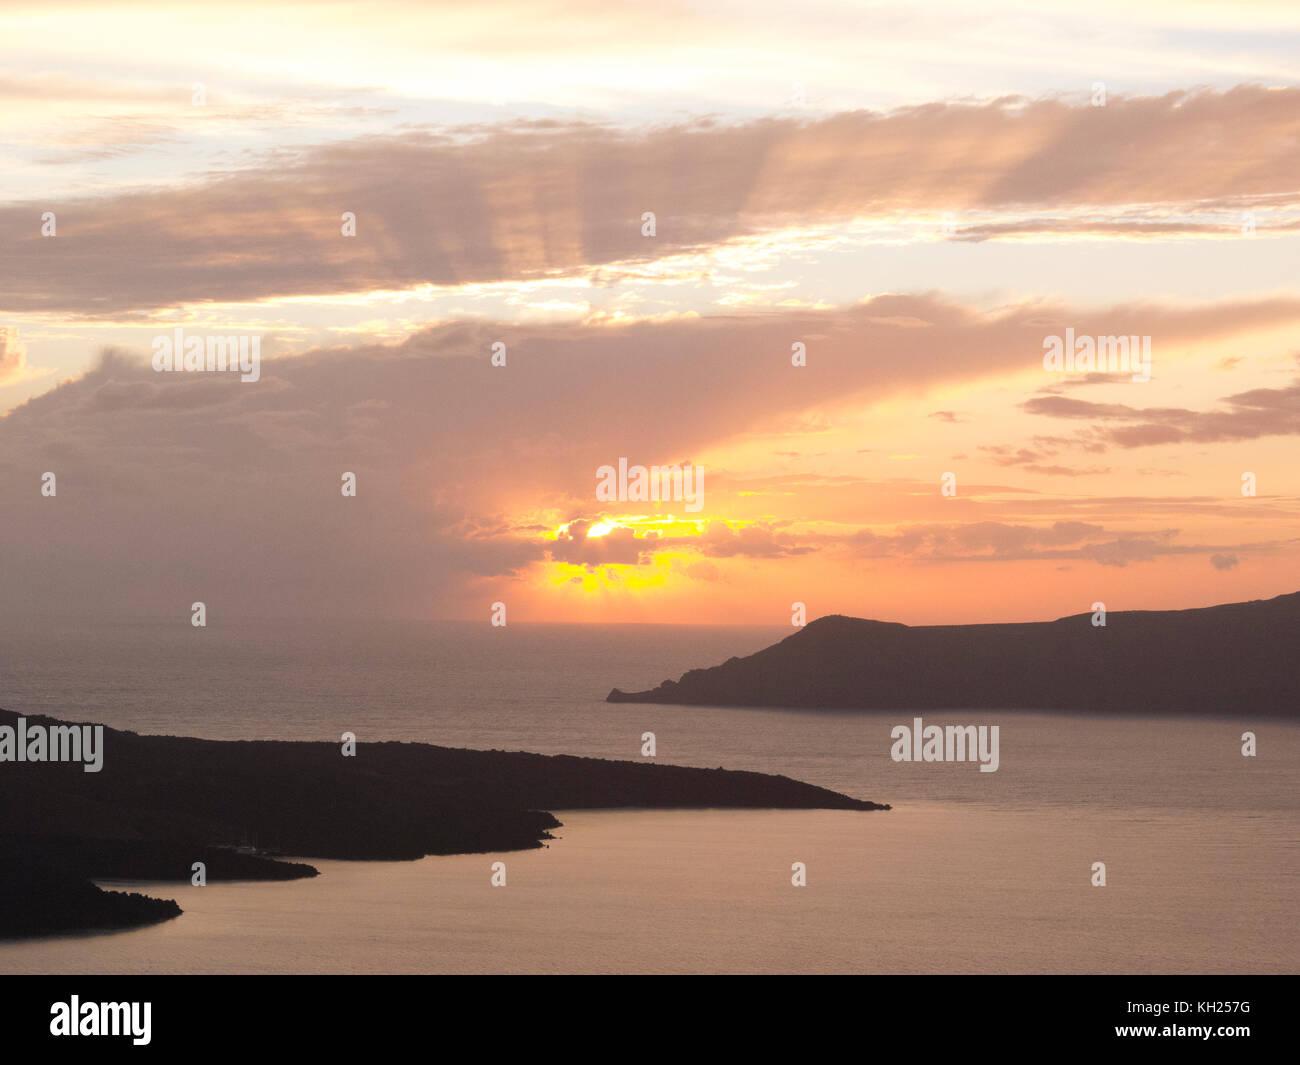 Setting sun over two landforms off the coast of Santorini, Greece, near the town of Oia - Stock Image